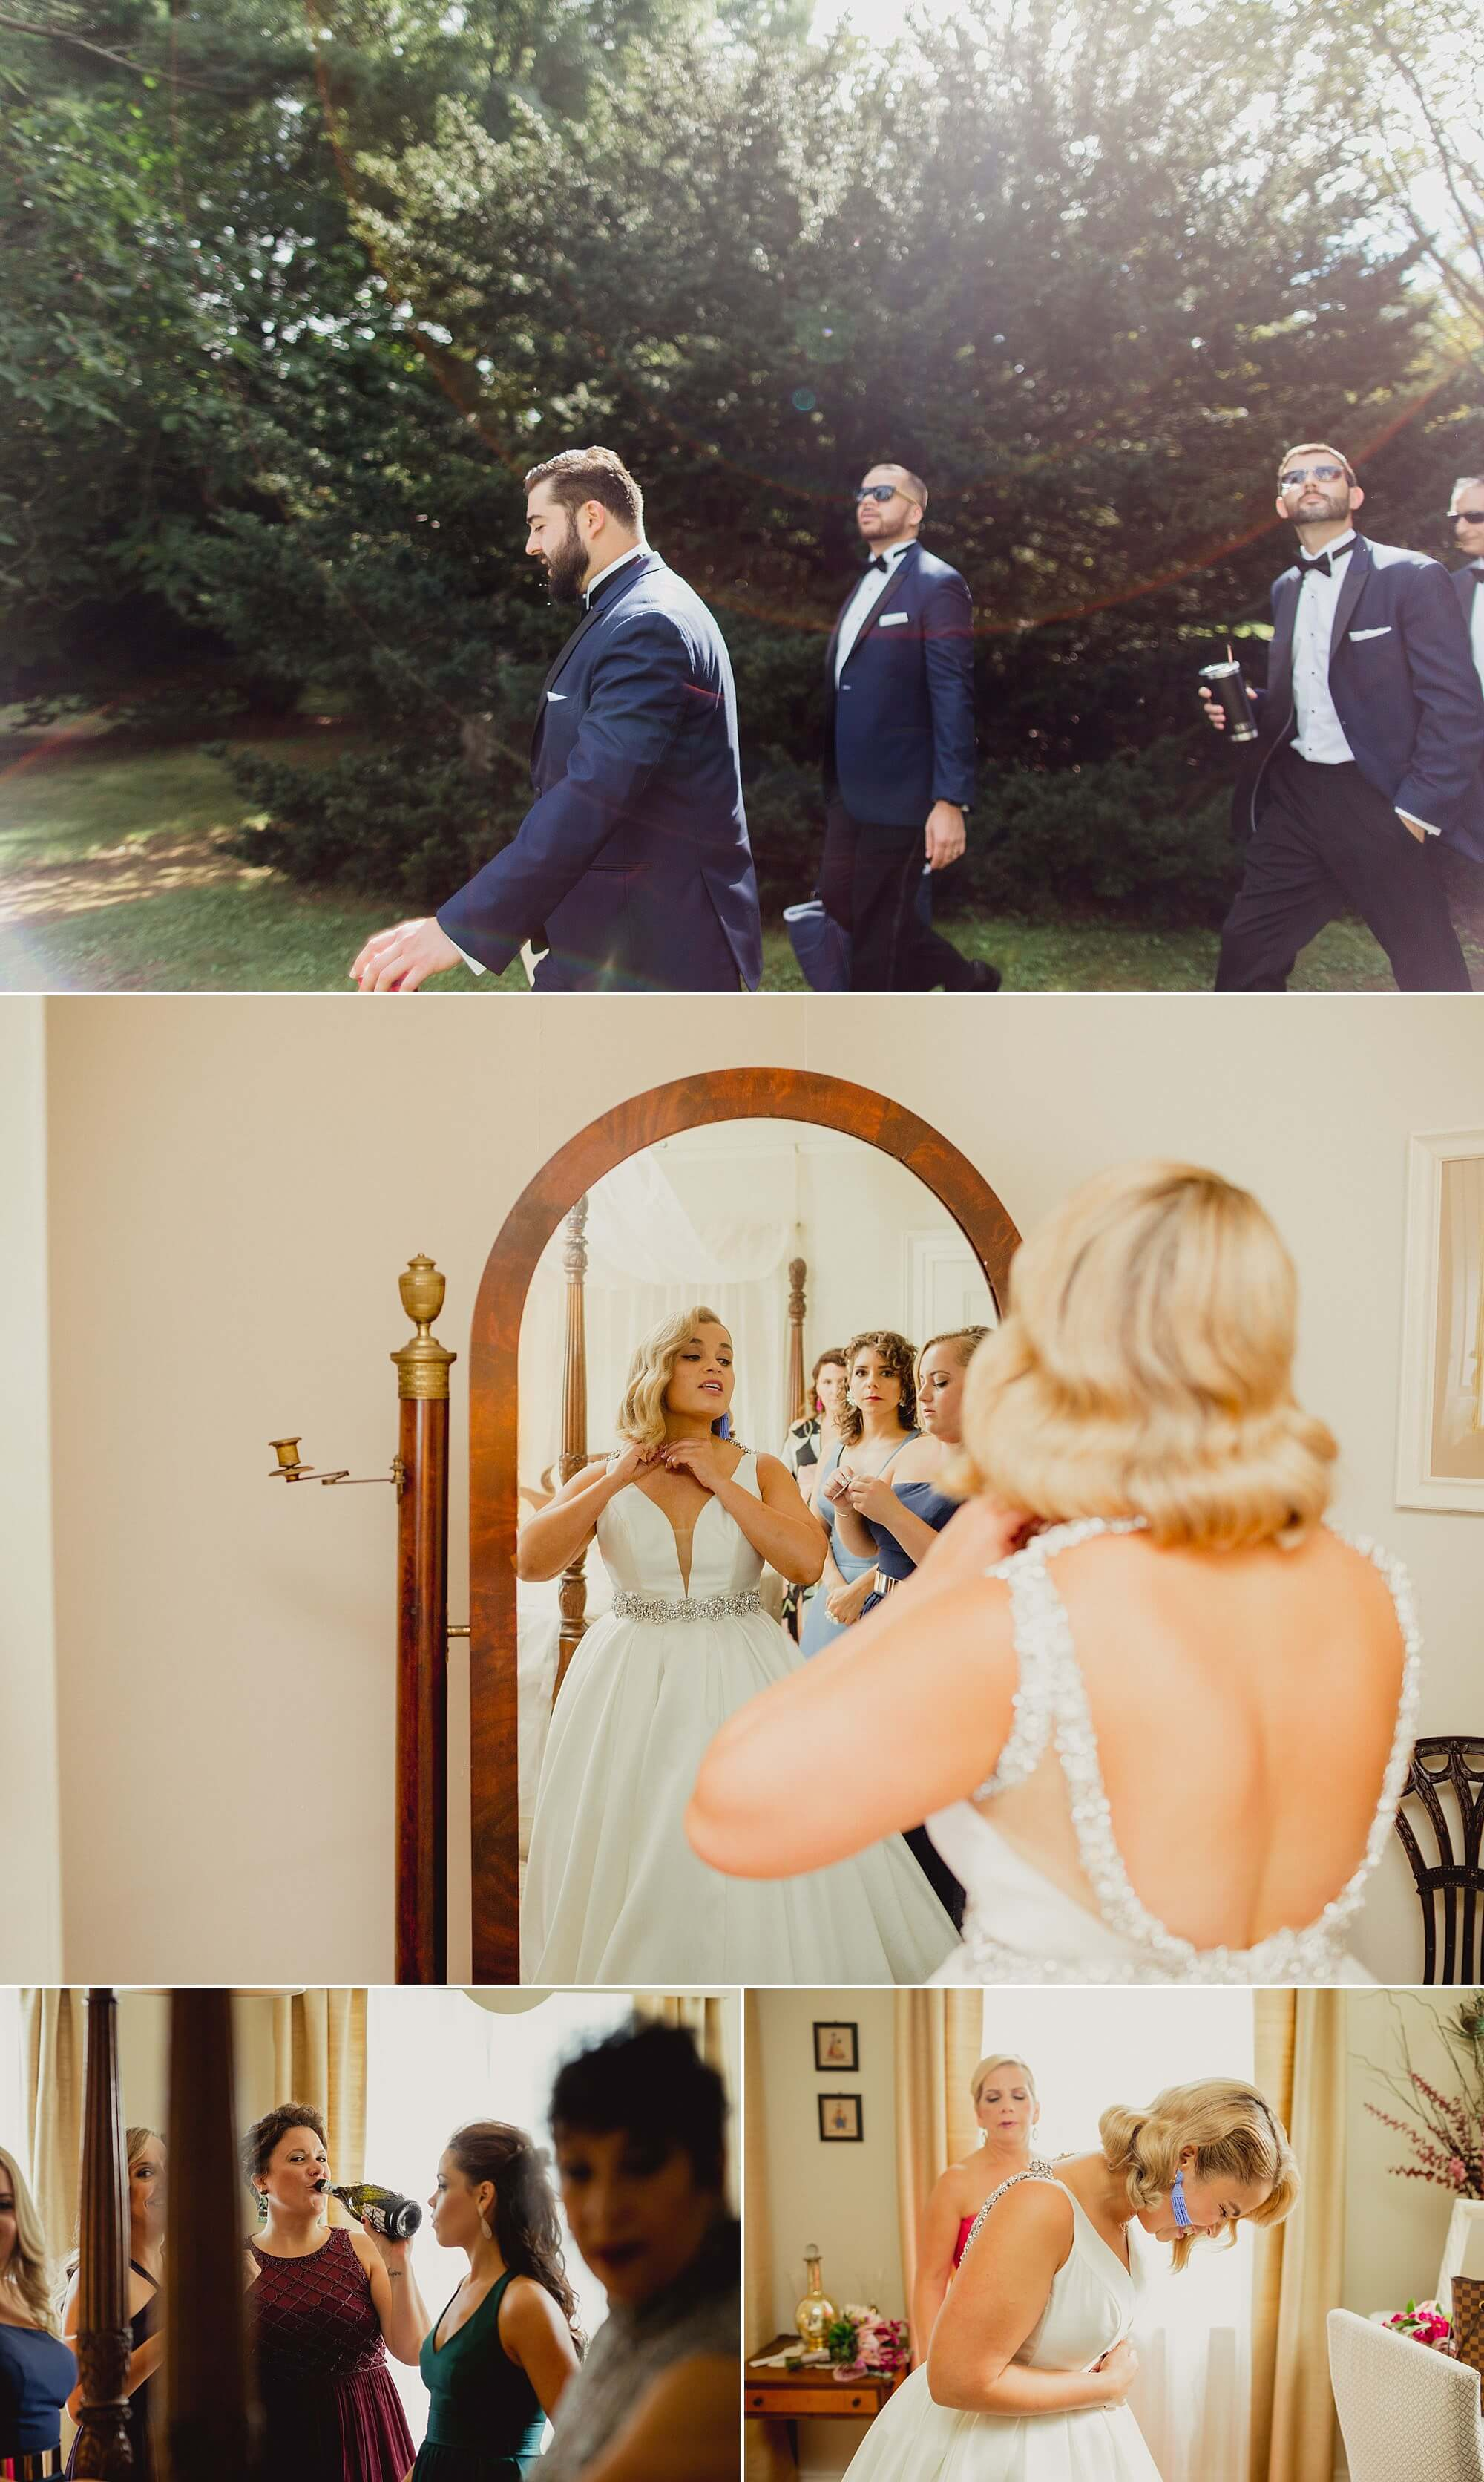 Glen Magna Farms Wedding - Ebersolephoto-2.jpg